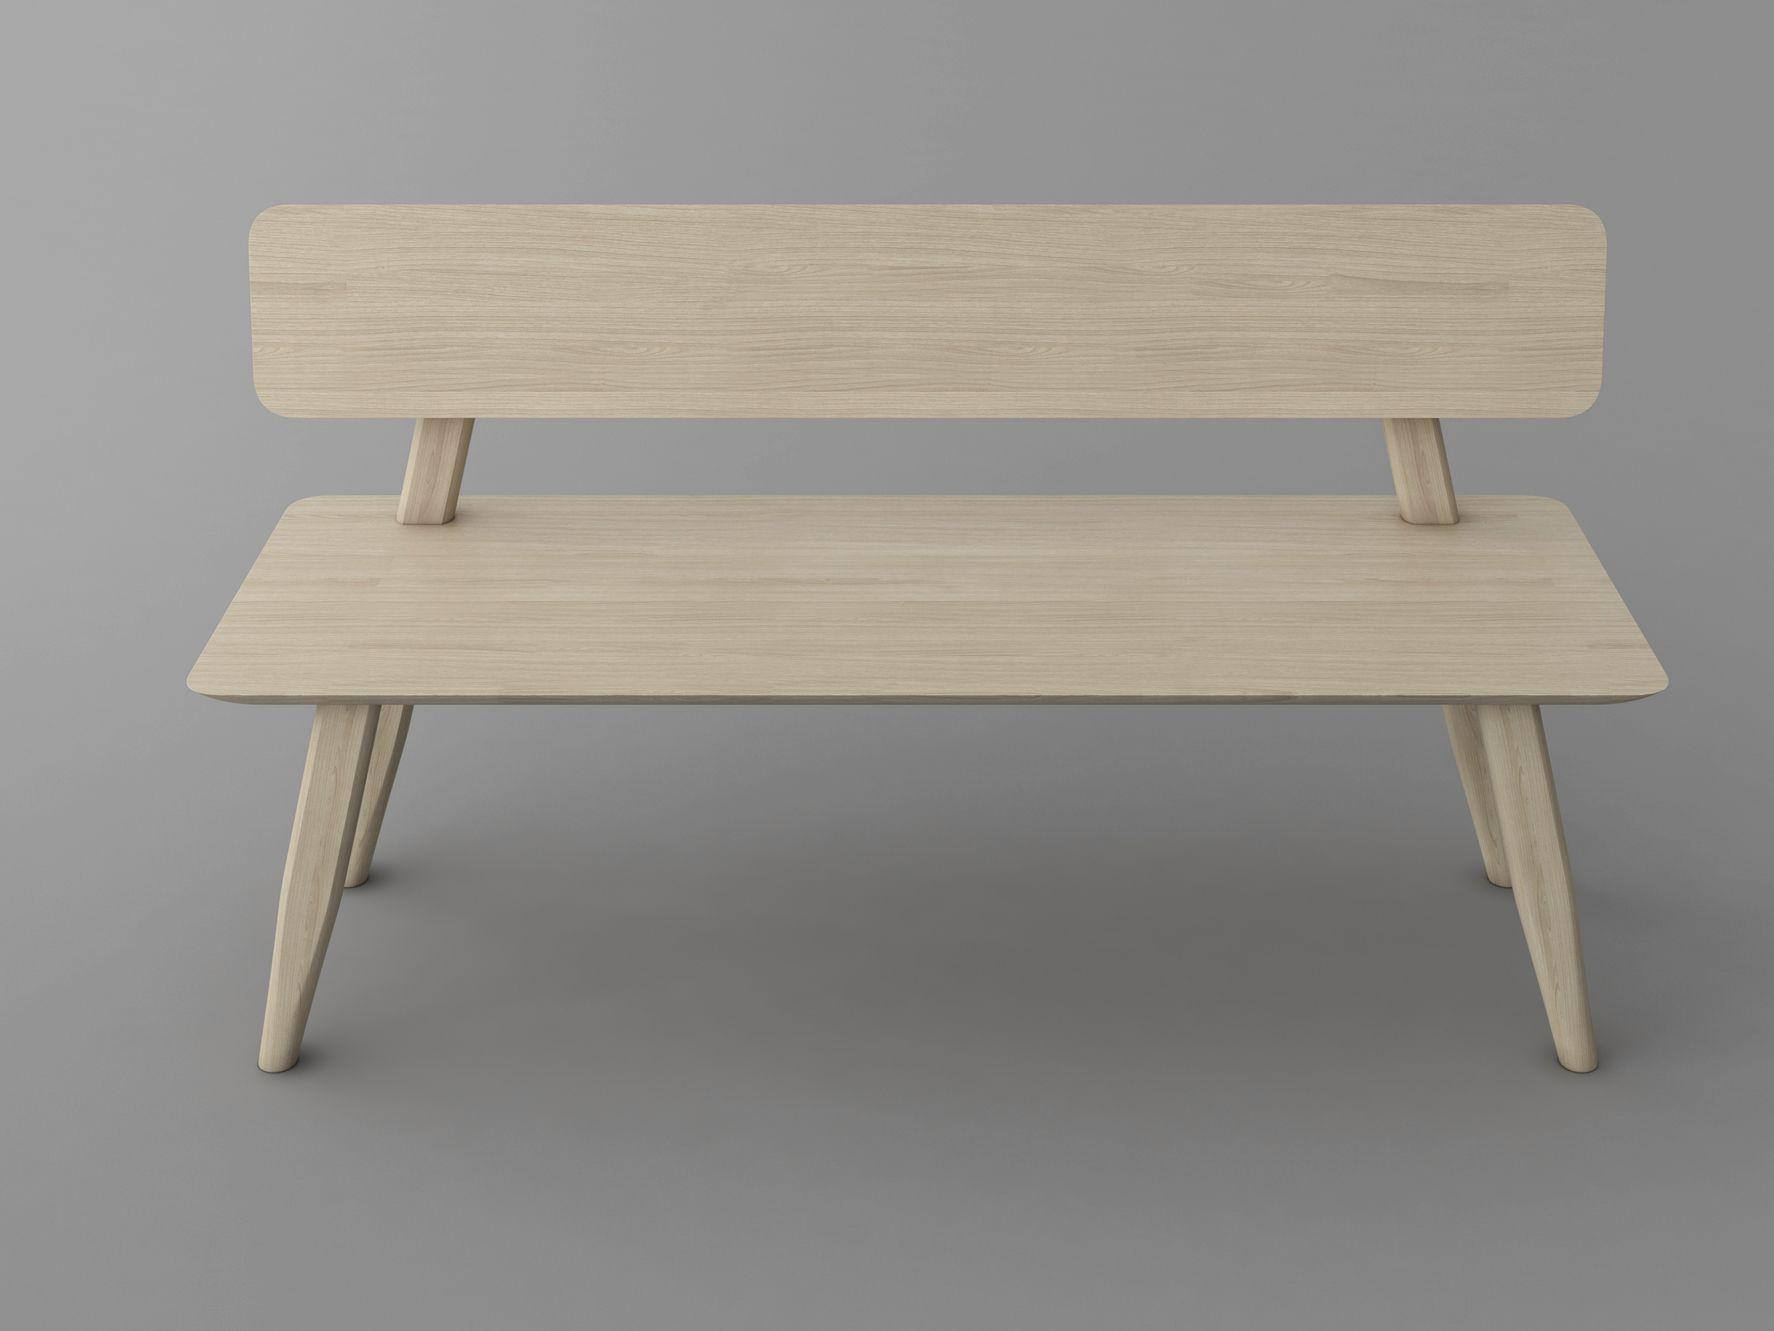 Aetas Bench With Back By Vitamin Design Design Gg Designart